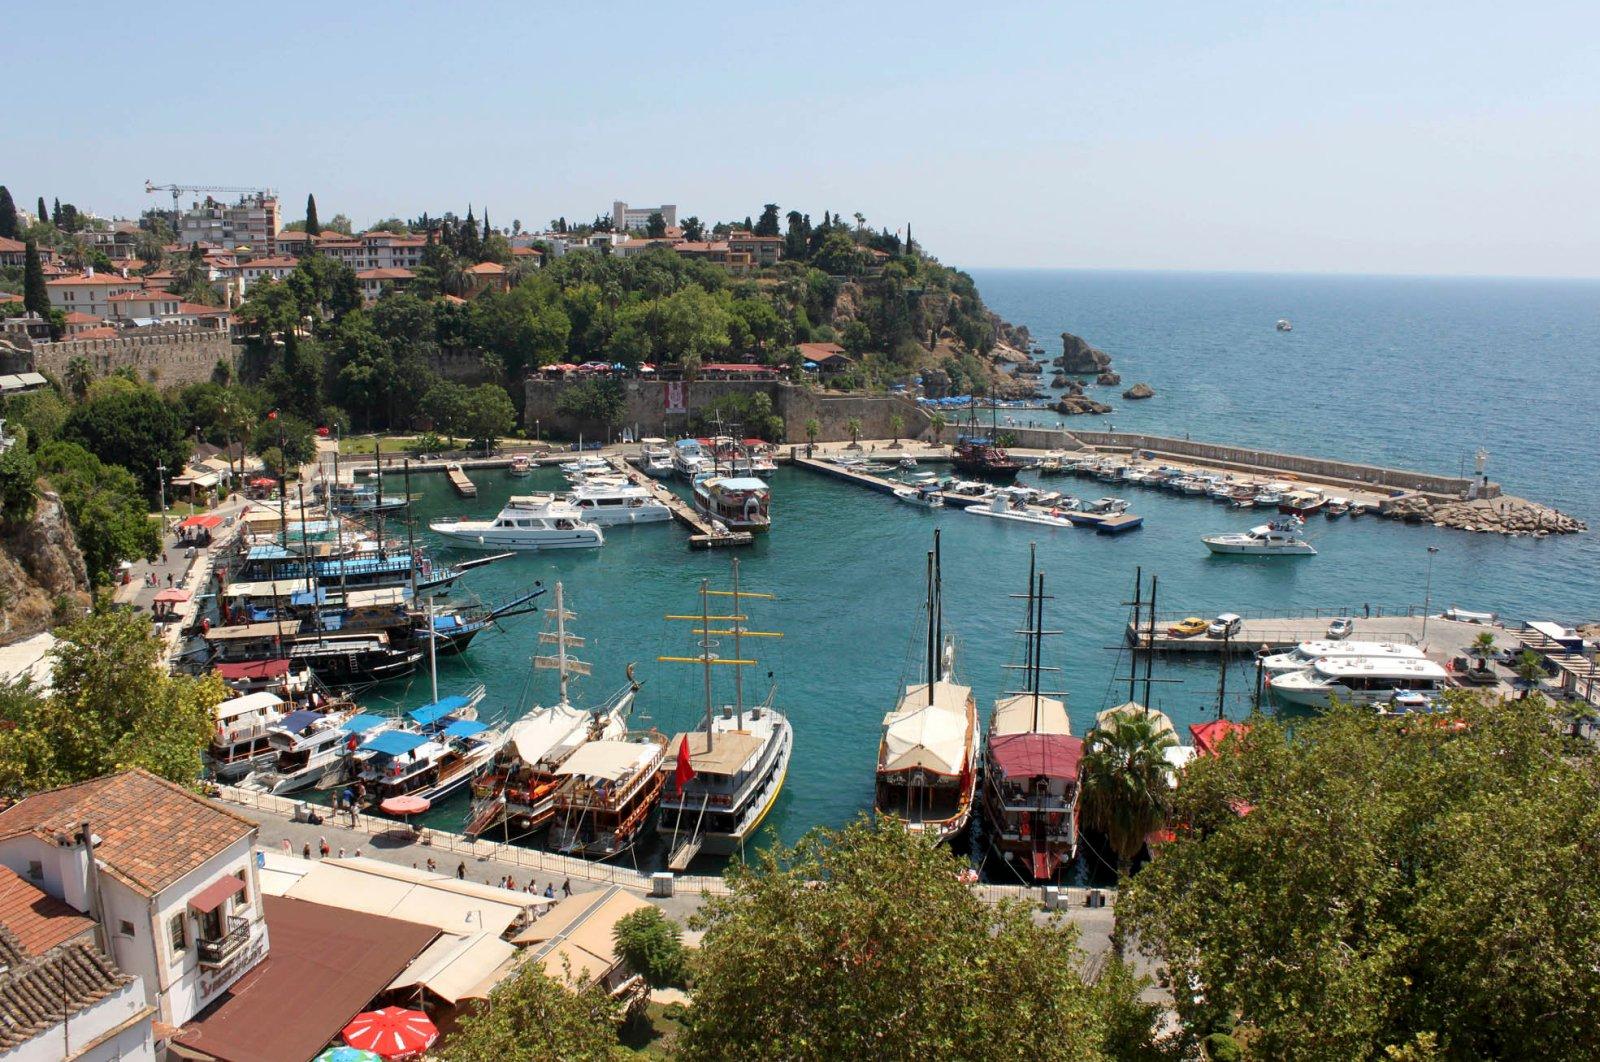 Boats sit anchored at a port in Antalya, southern Turkey, Aug. 28, 2018. (DHA Photo)